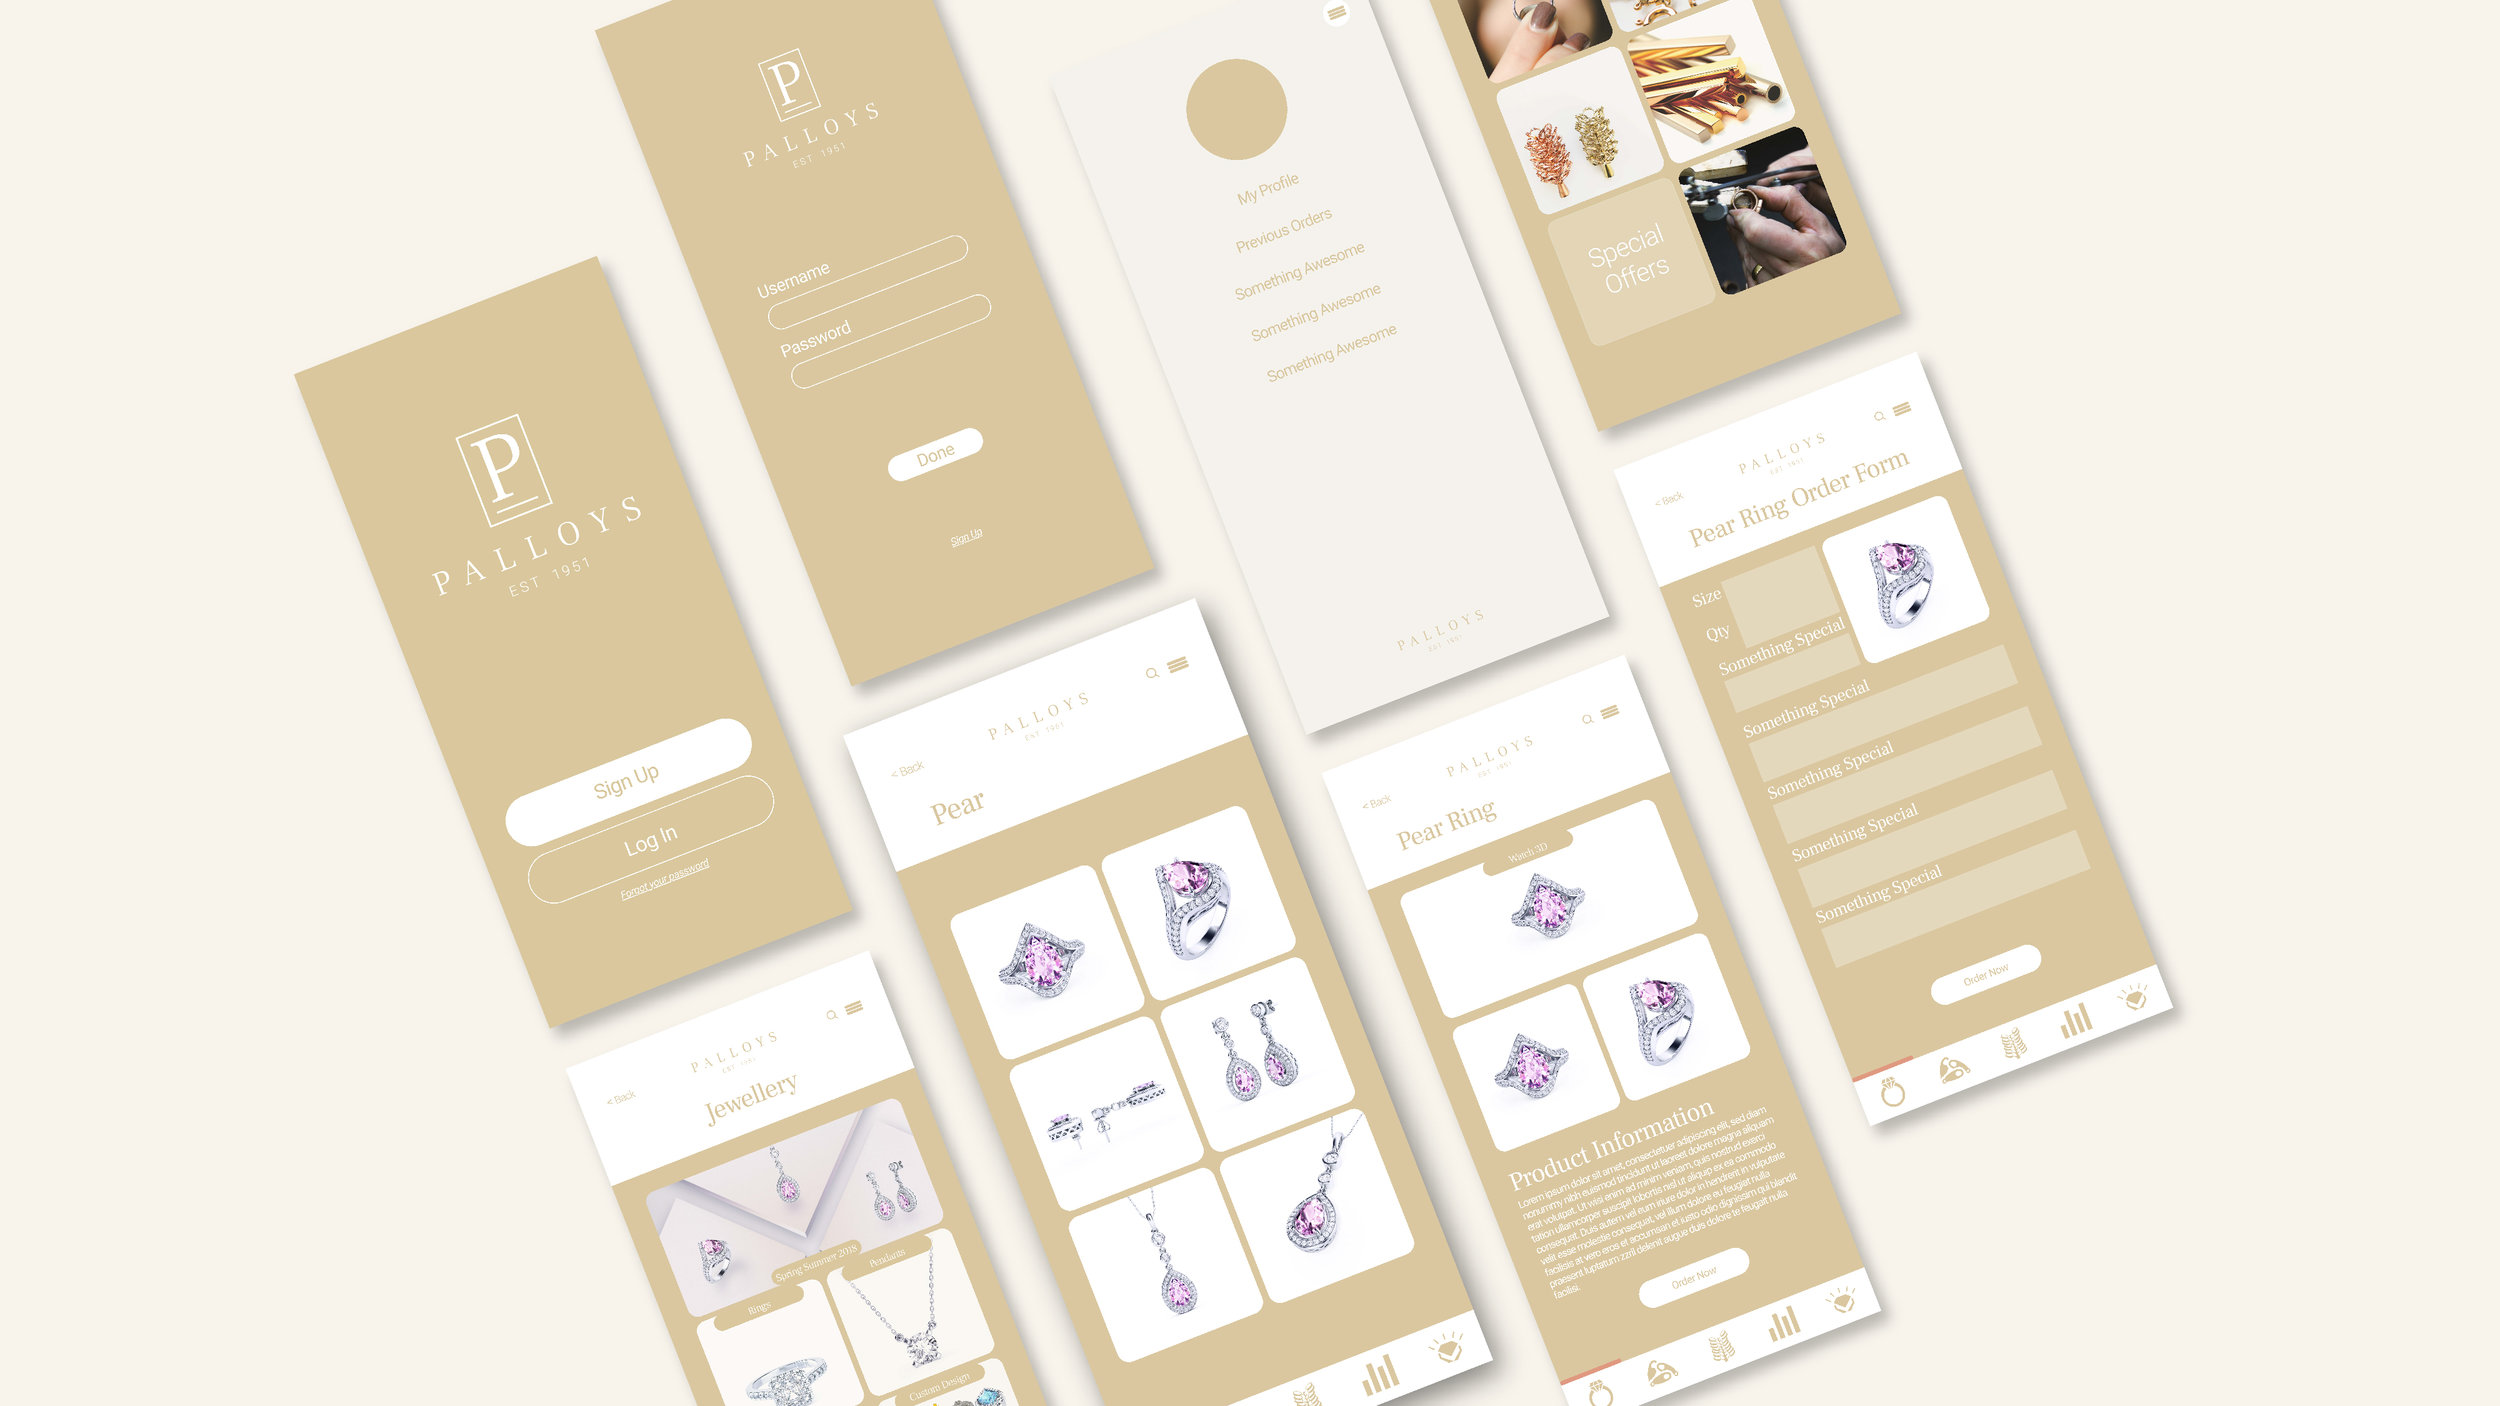 Palloys App Preview 1-01.jpg